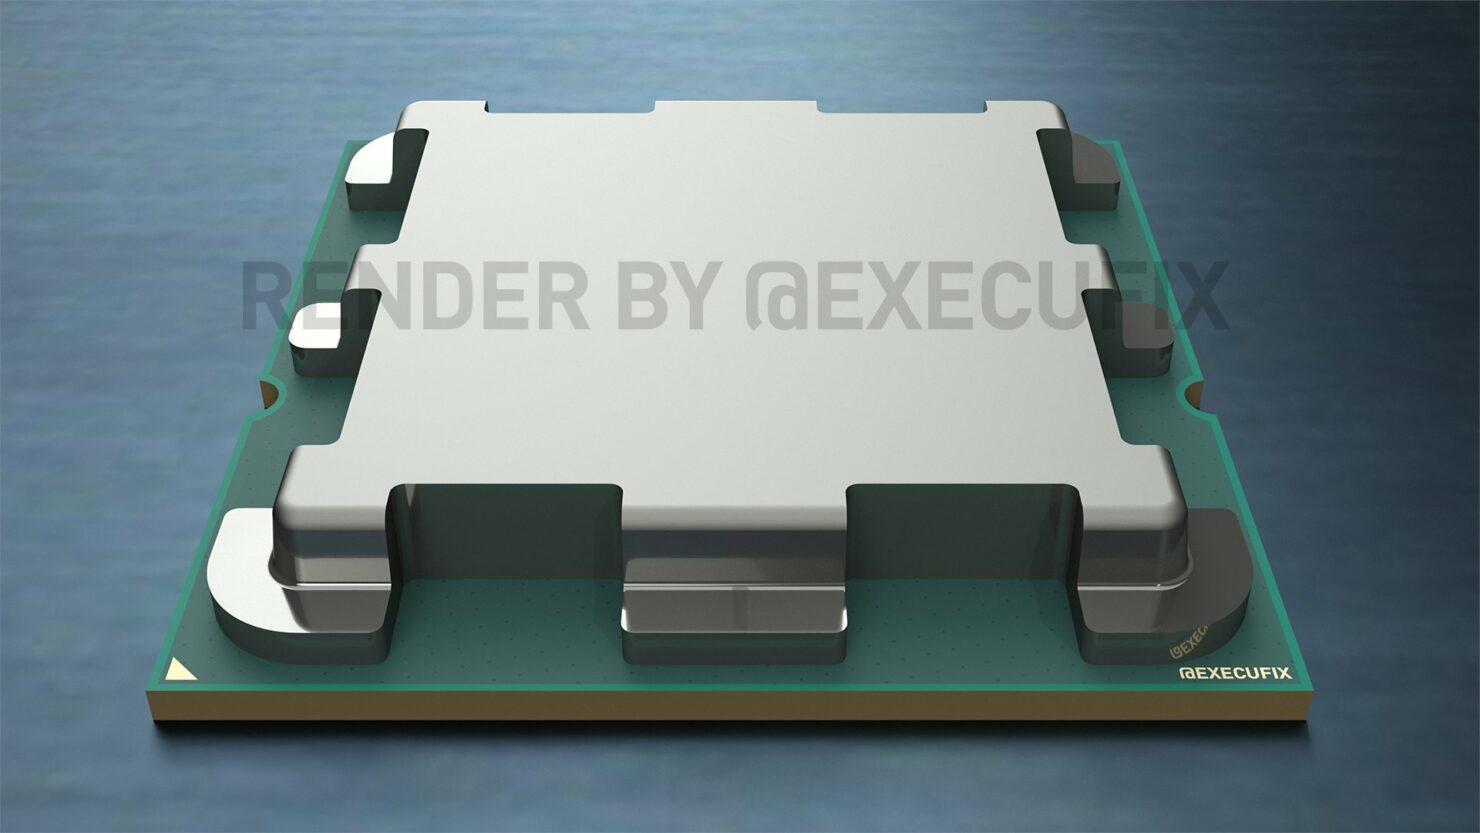 amd-ryzen-raphael-zen-4-desktop-cpus-for-am5-lga-1718-socket-platform-package-pictured-_1